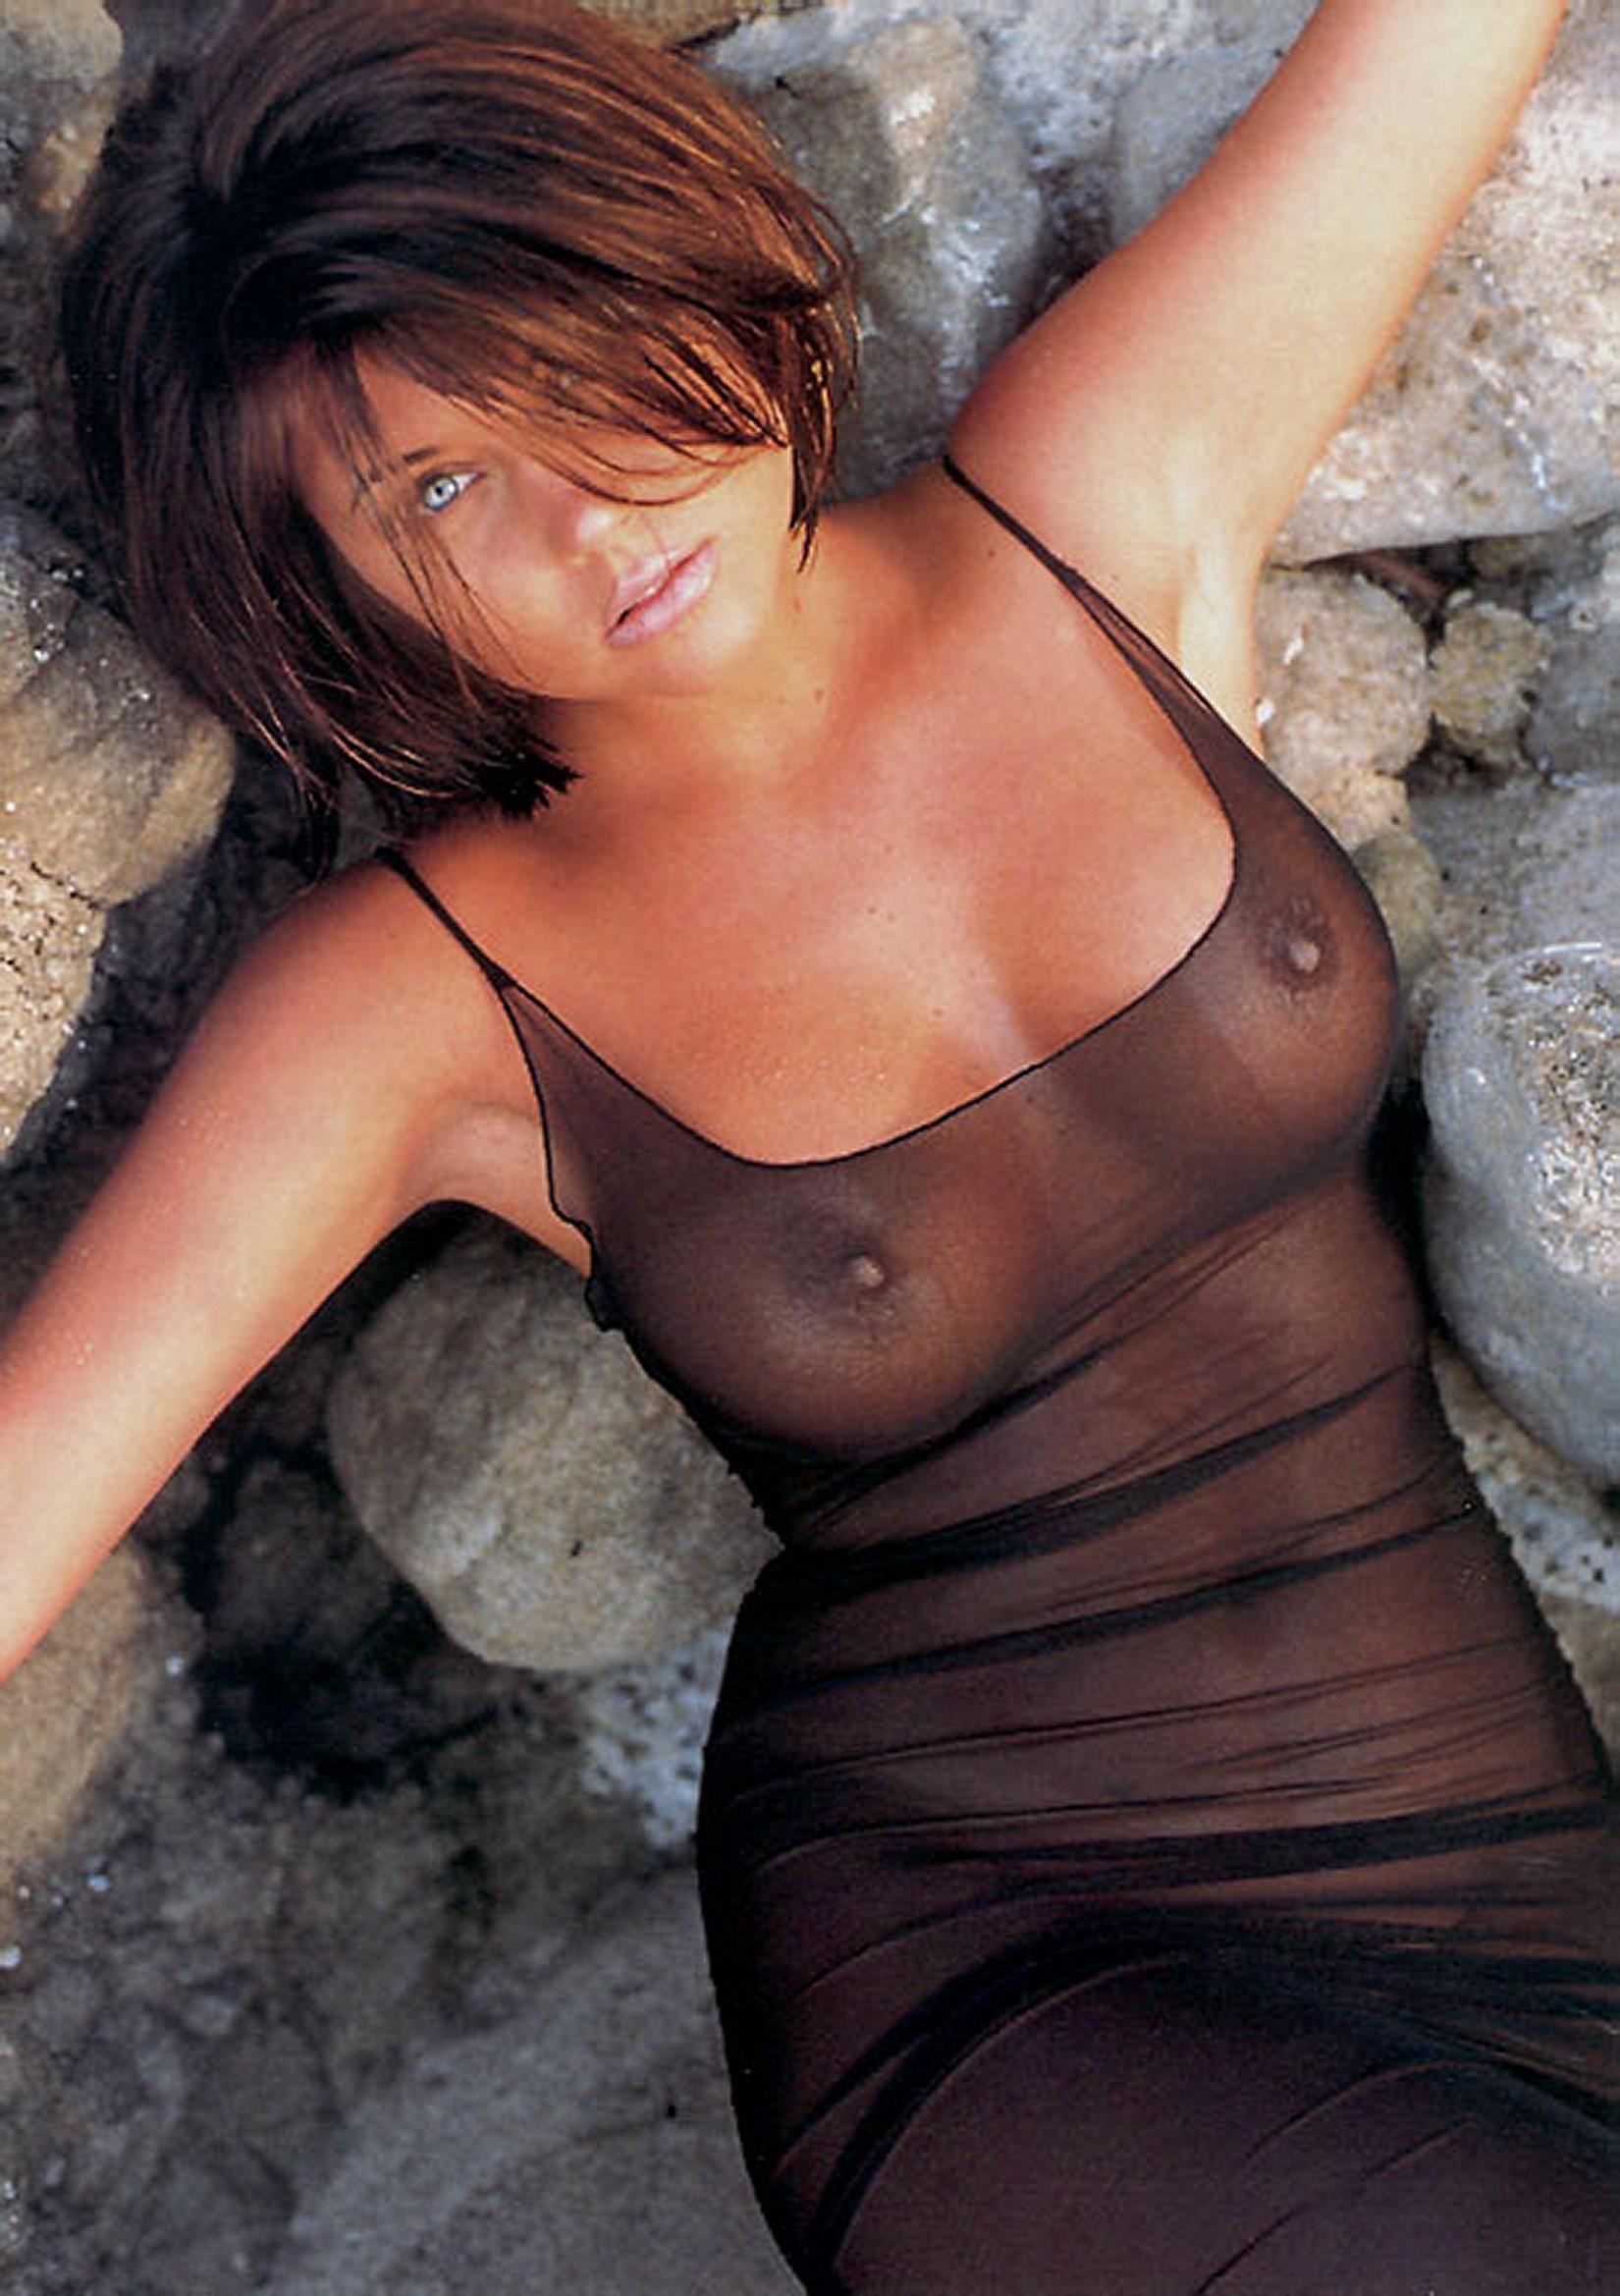 Beach live web cams nudist